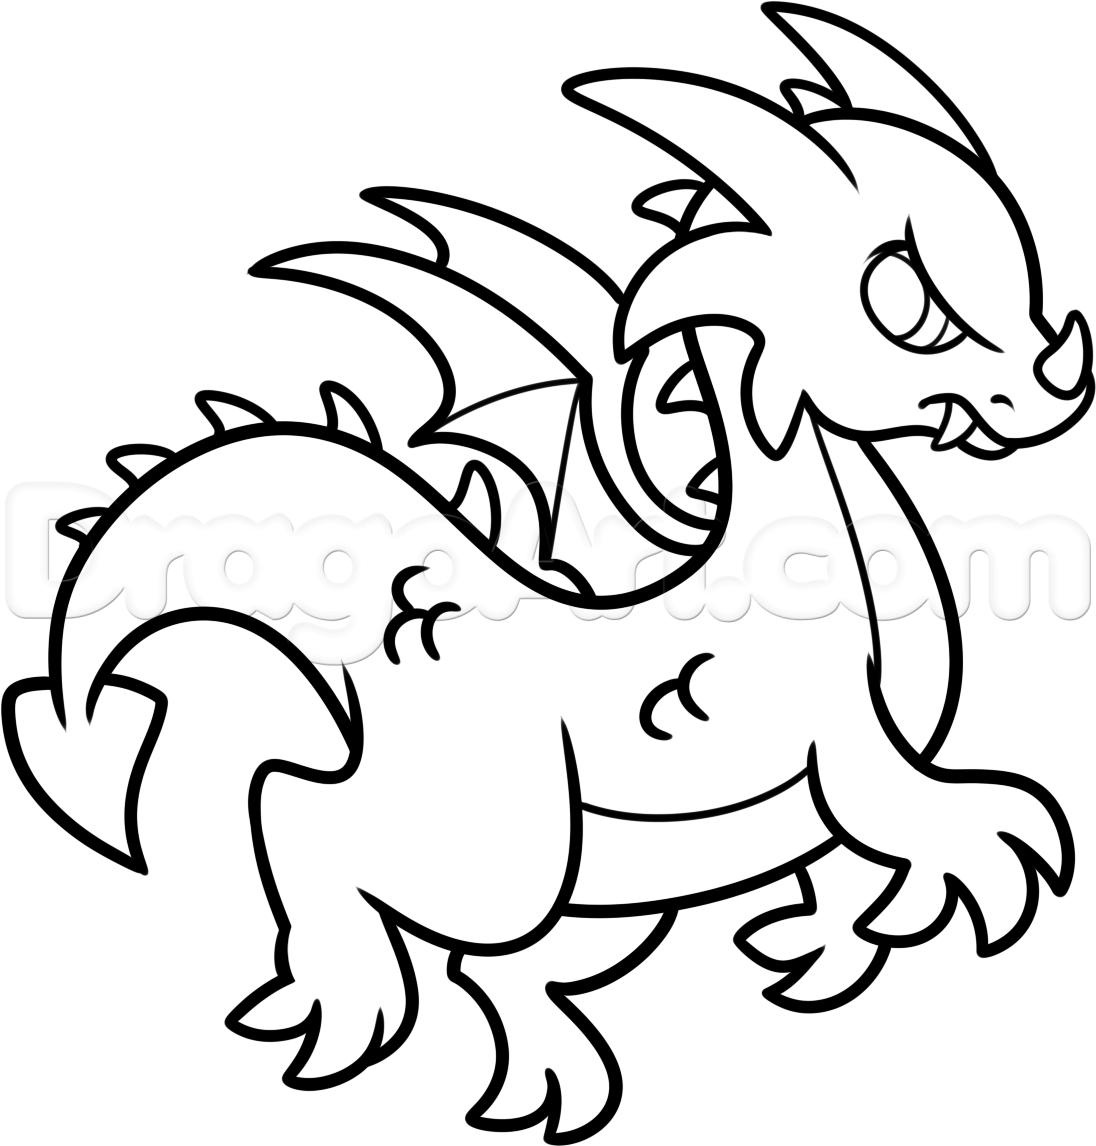 1096x1146 Drawn Dragon Simple